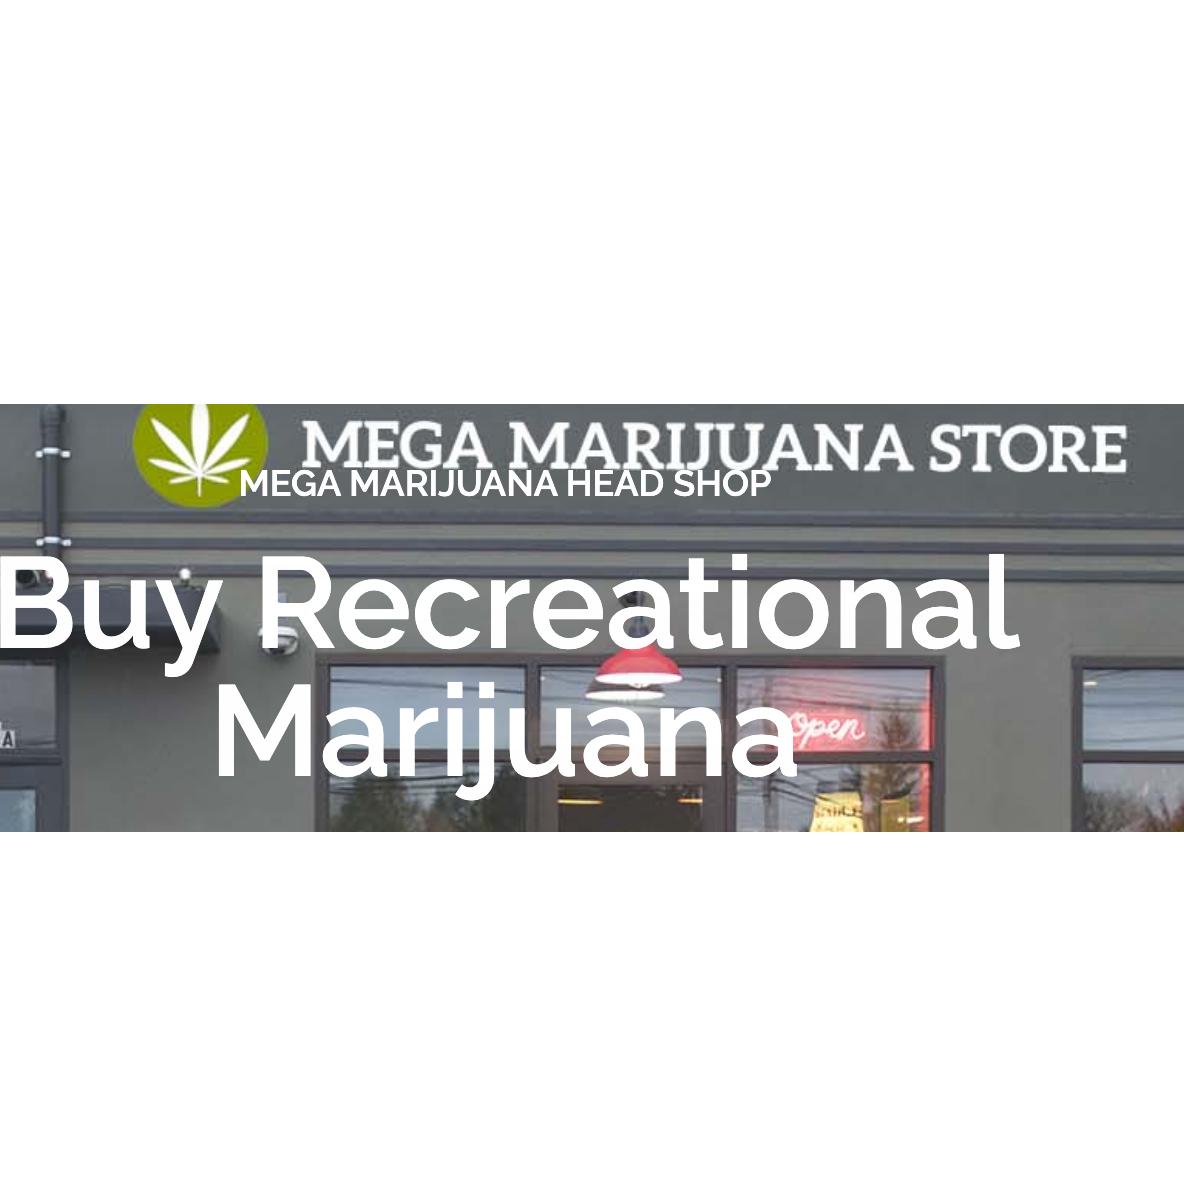 Megamarijuanastore